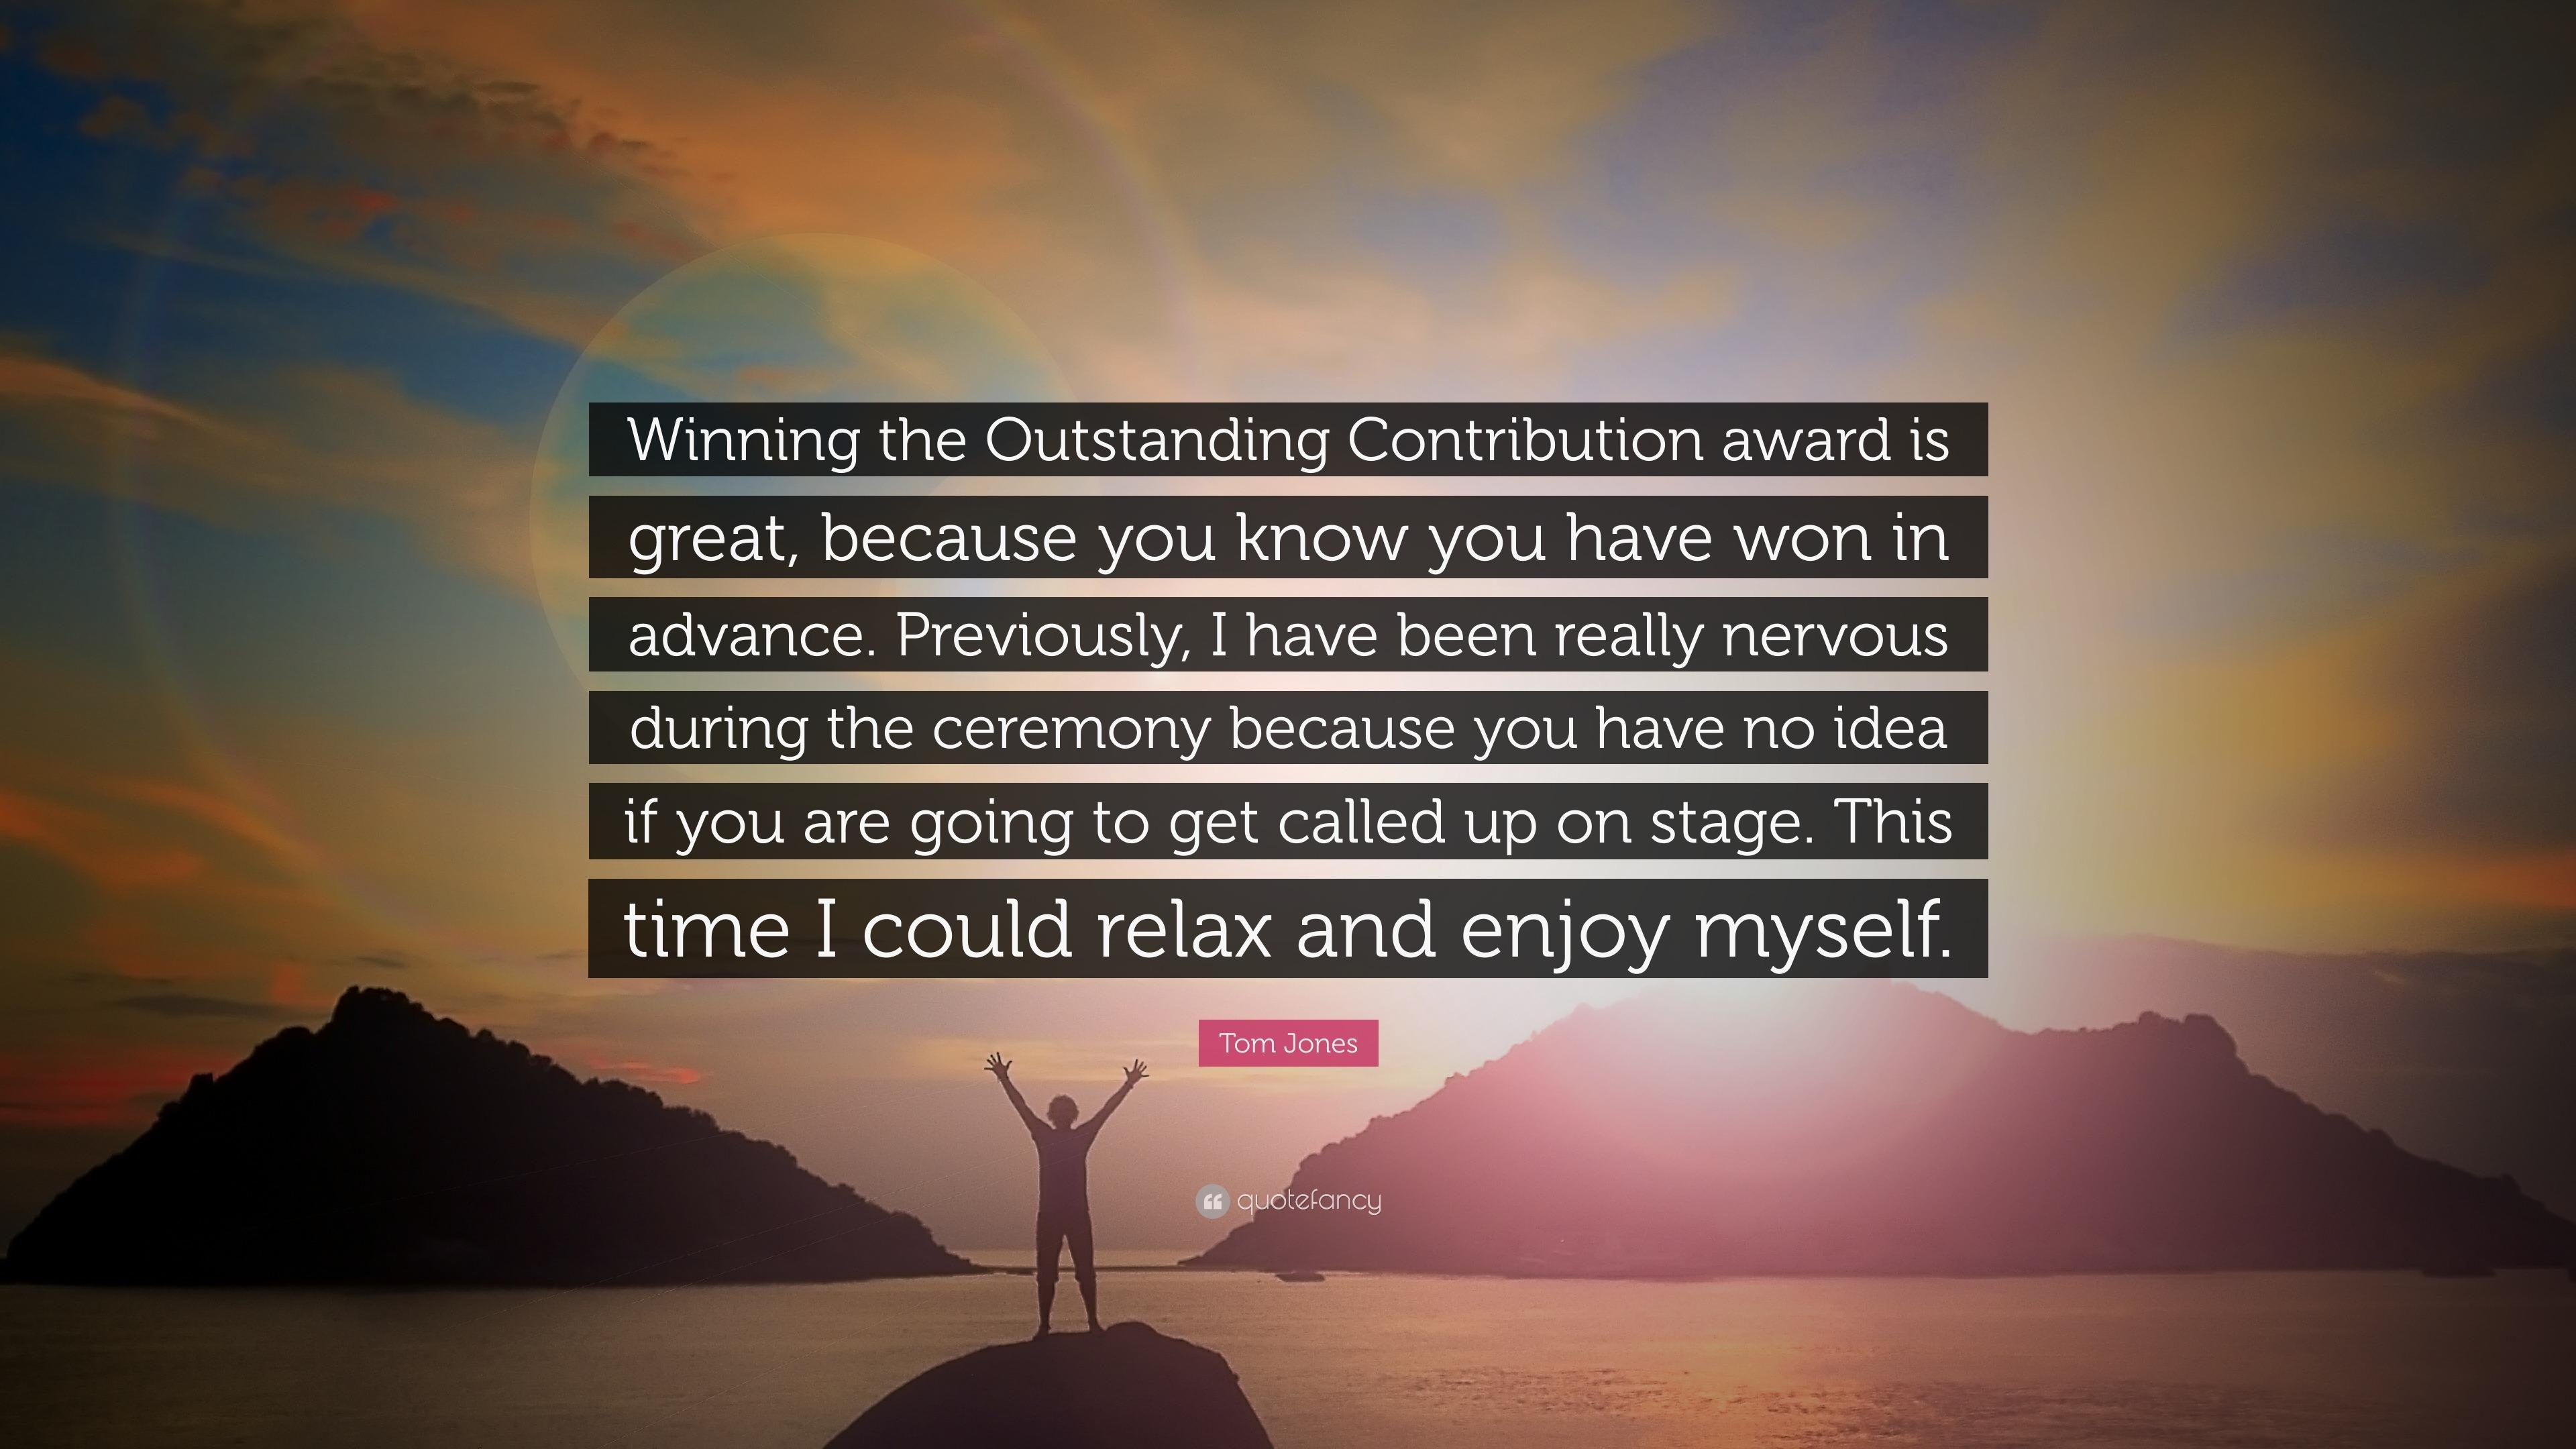 tom jones quote   u201cwinning the outstanding contribution